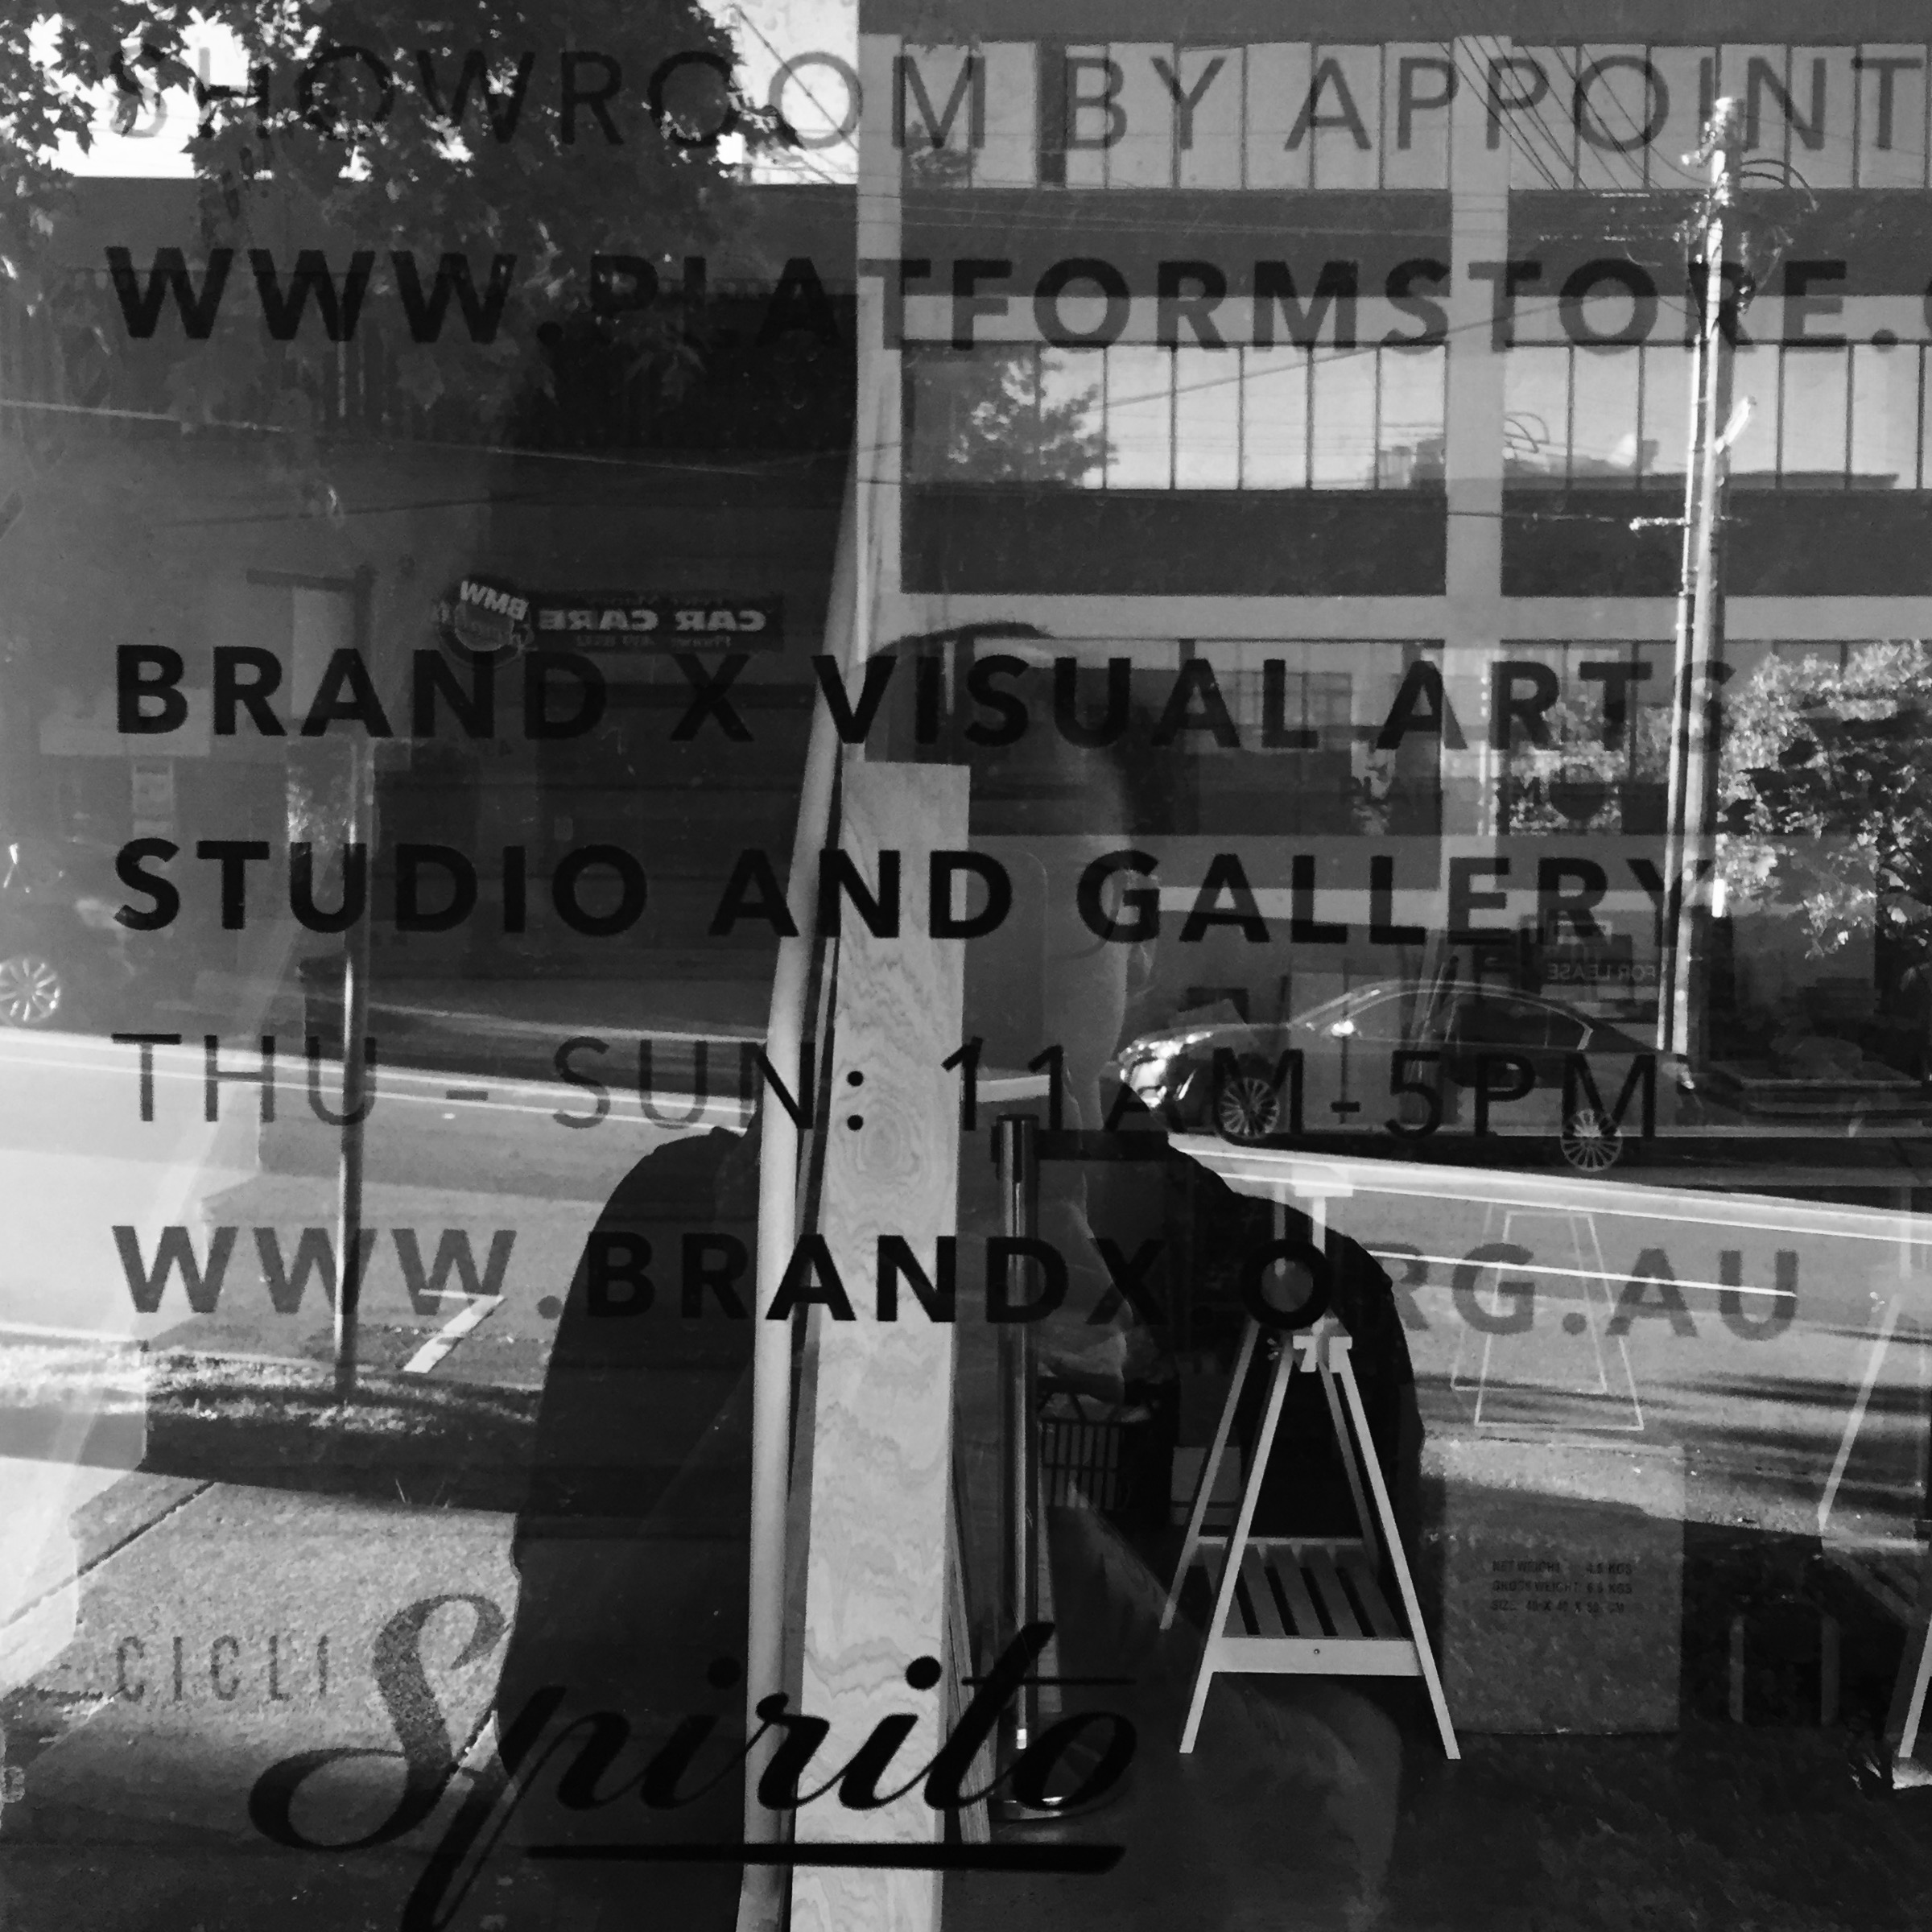 Brand X Studios, St Leonards. 2015/16